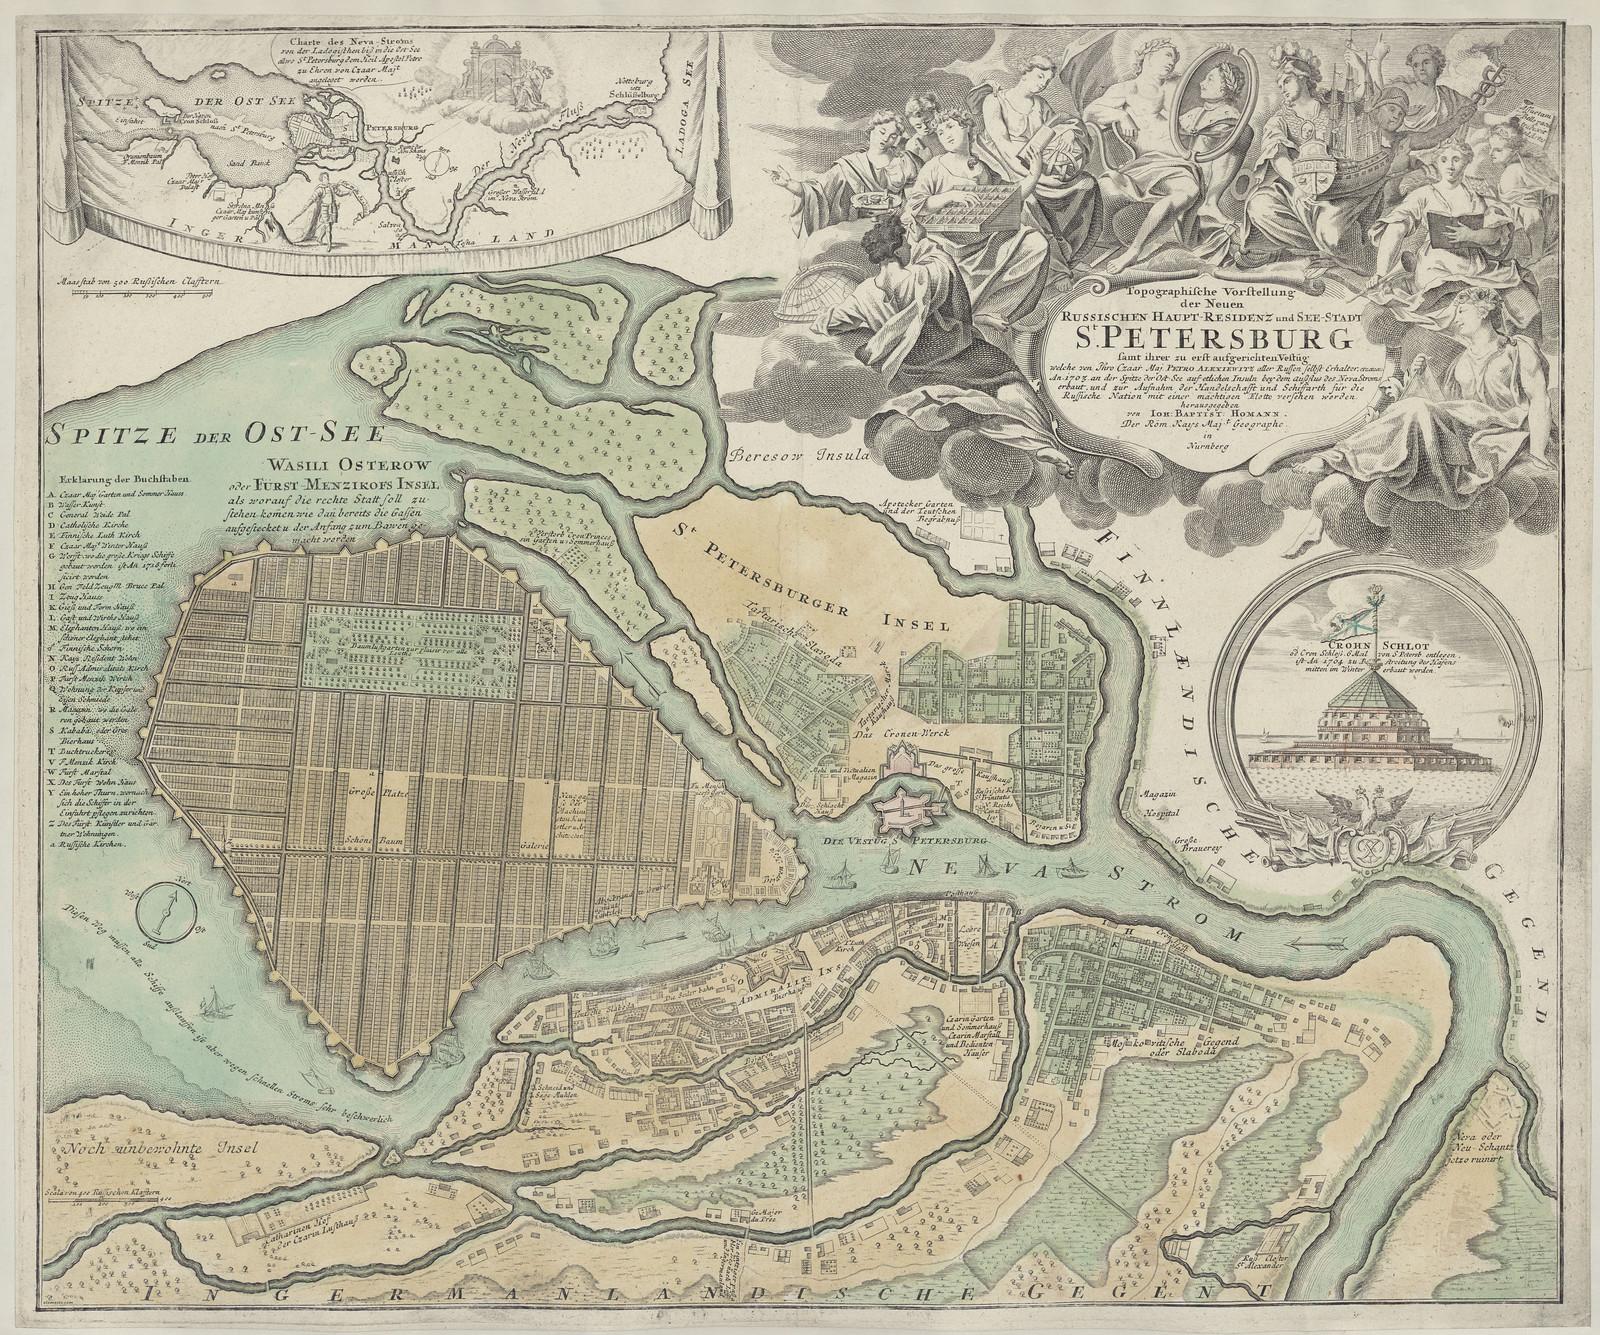 1720. План Санкт-Петербурга от Хоманна